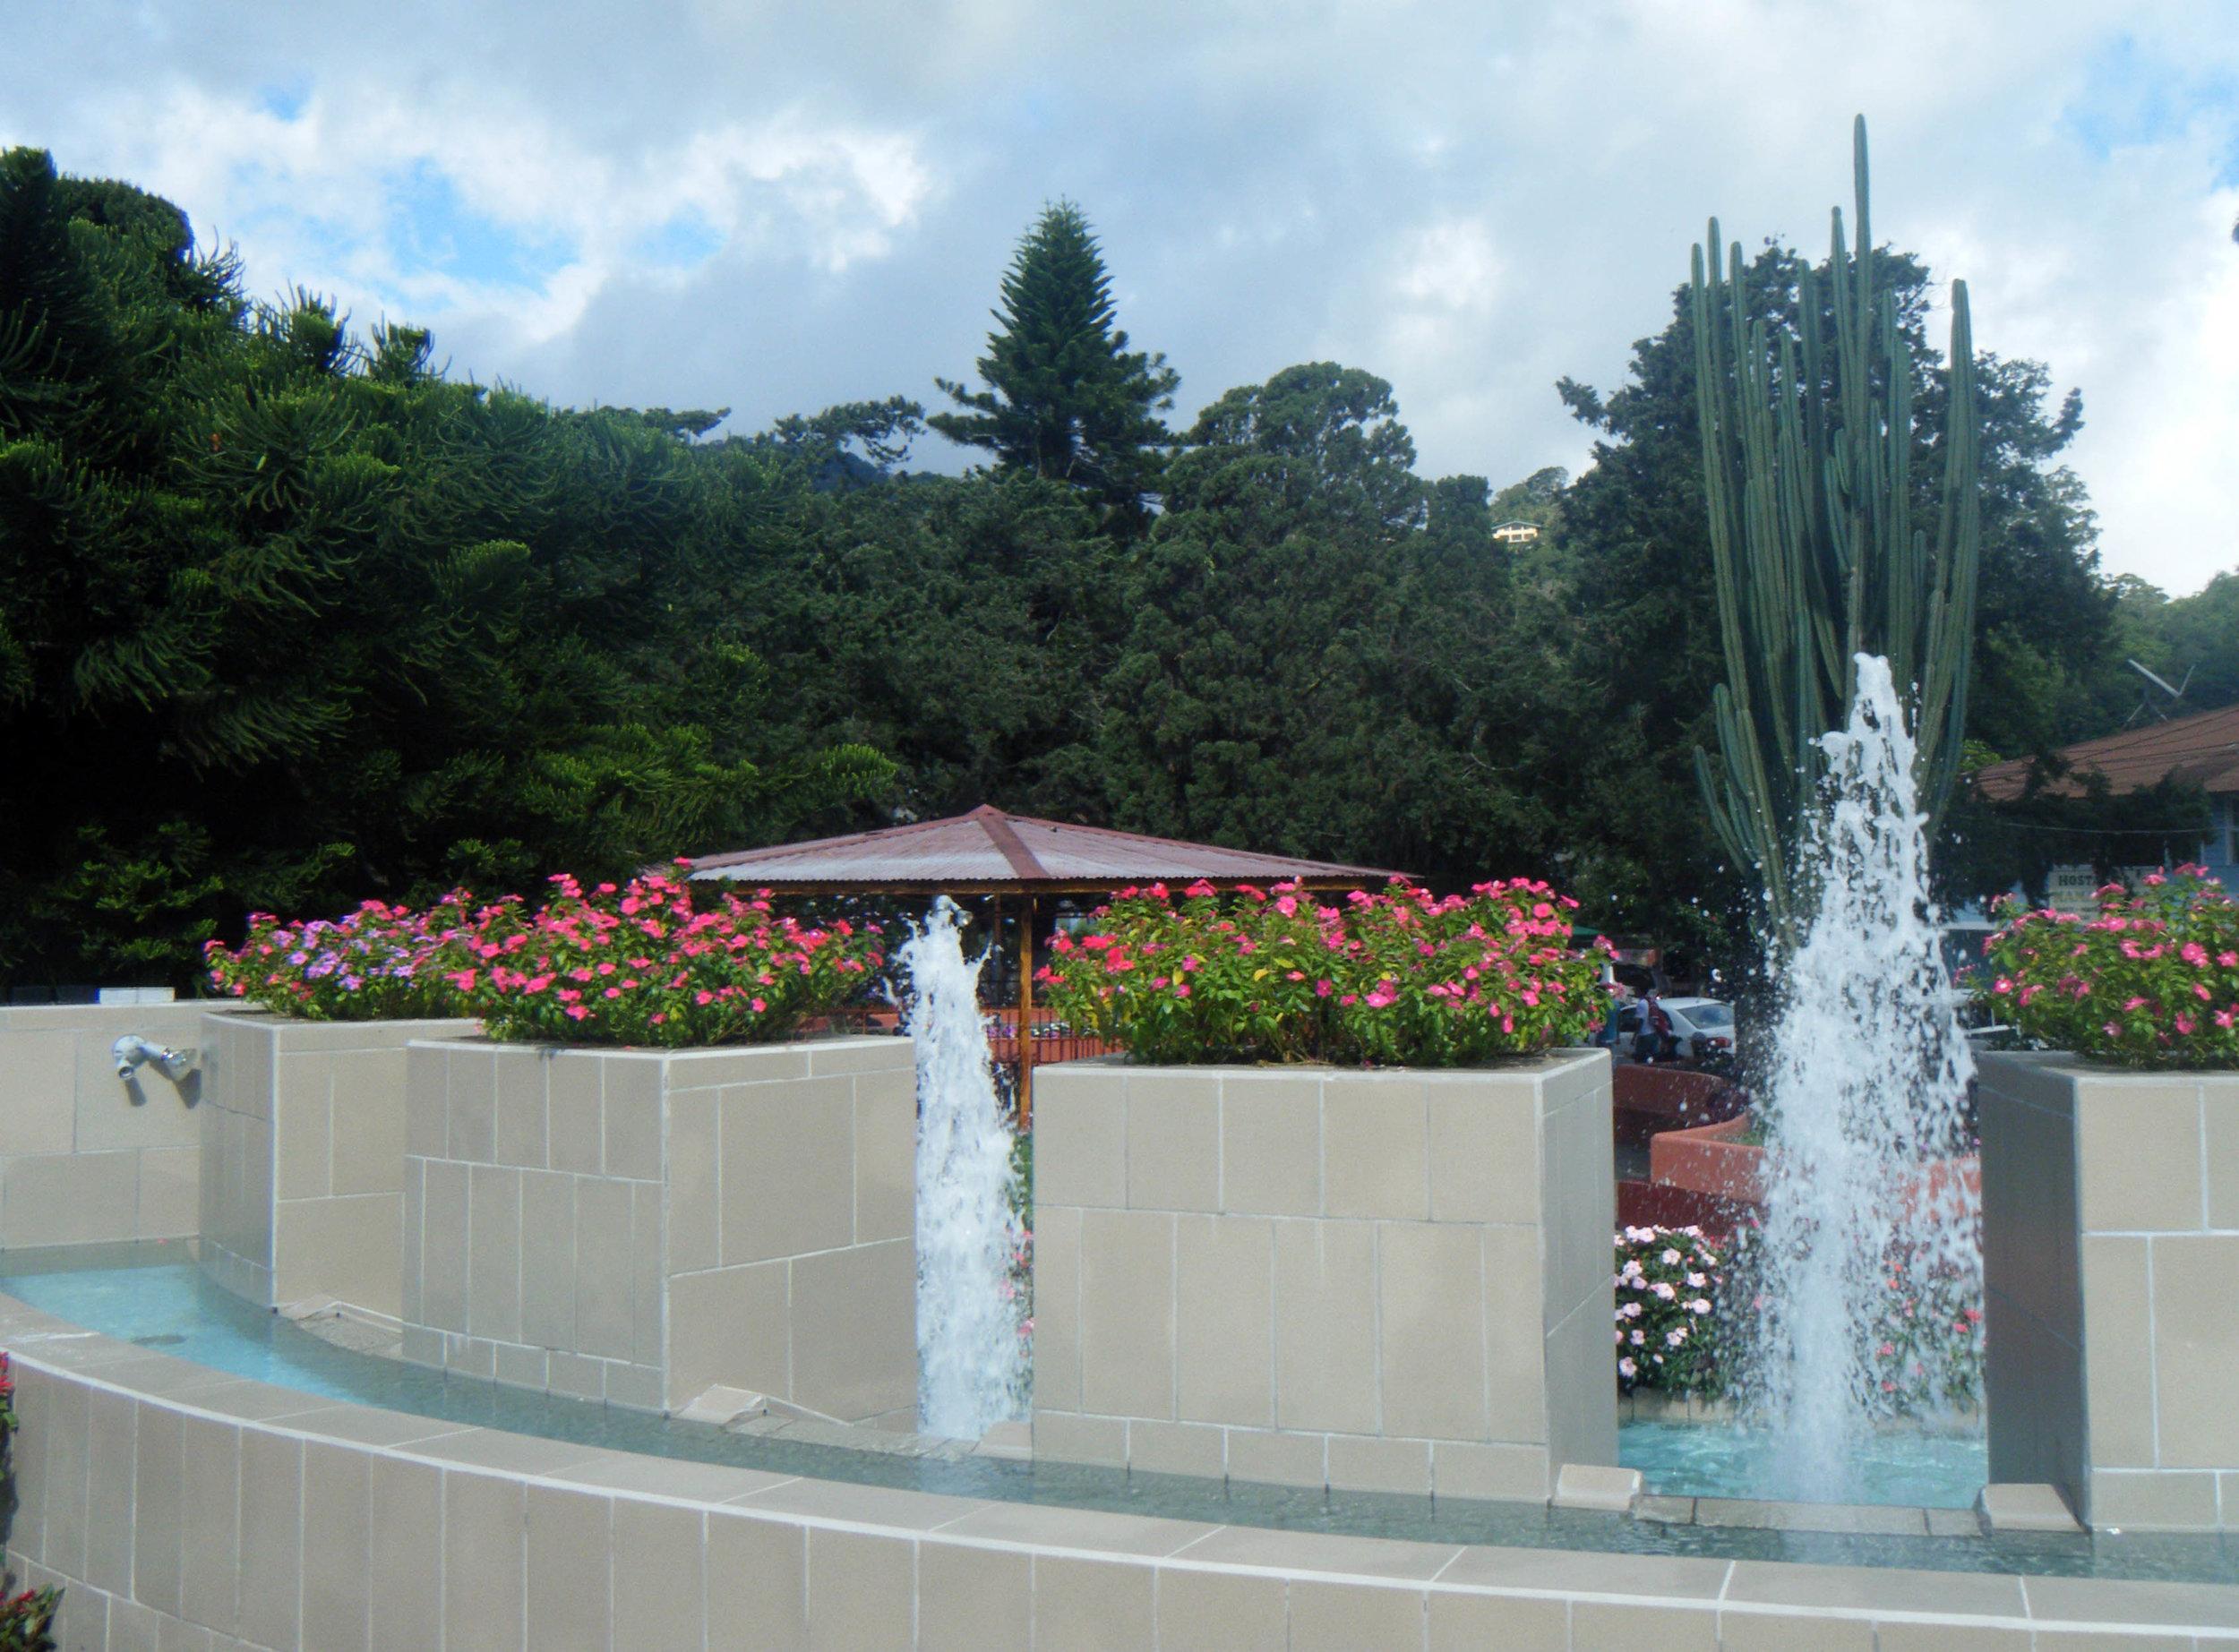 central park 7-21-12.jpg